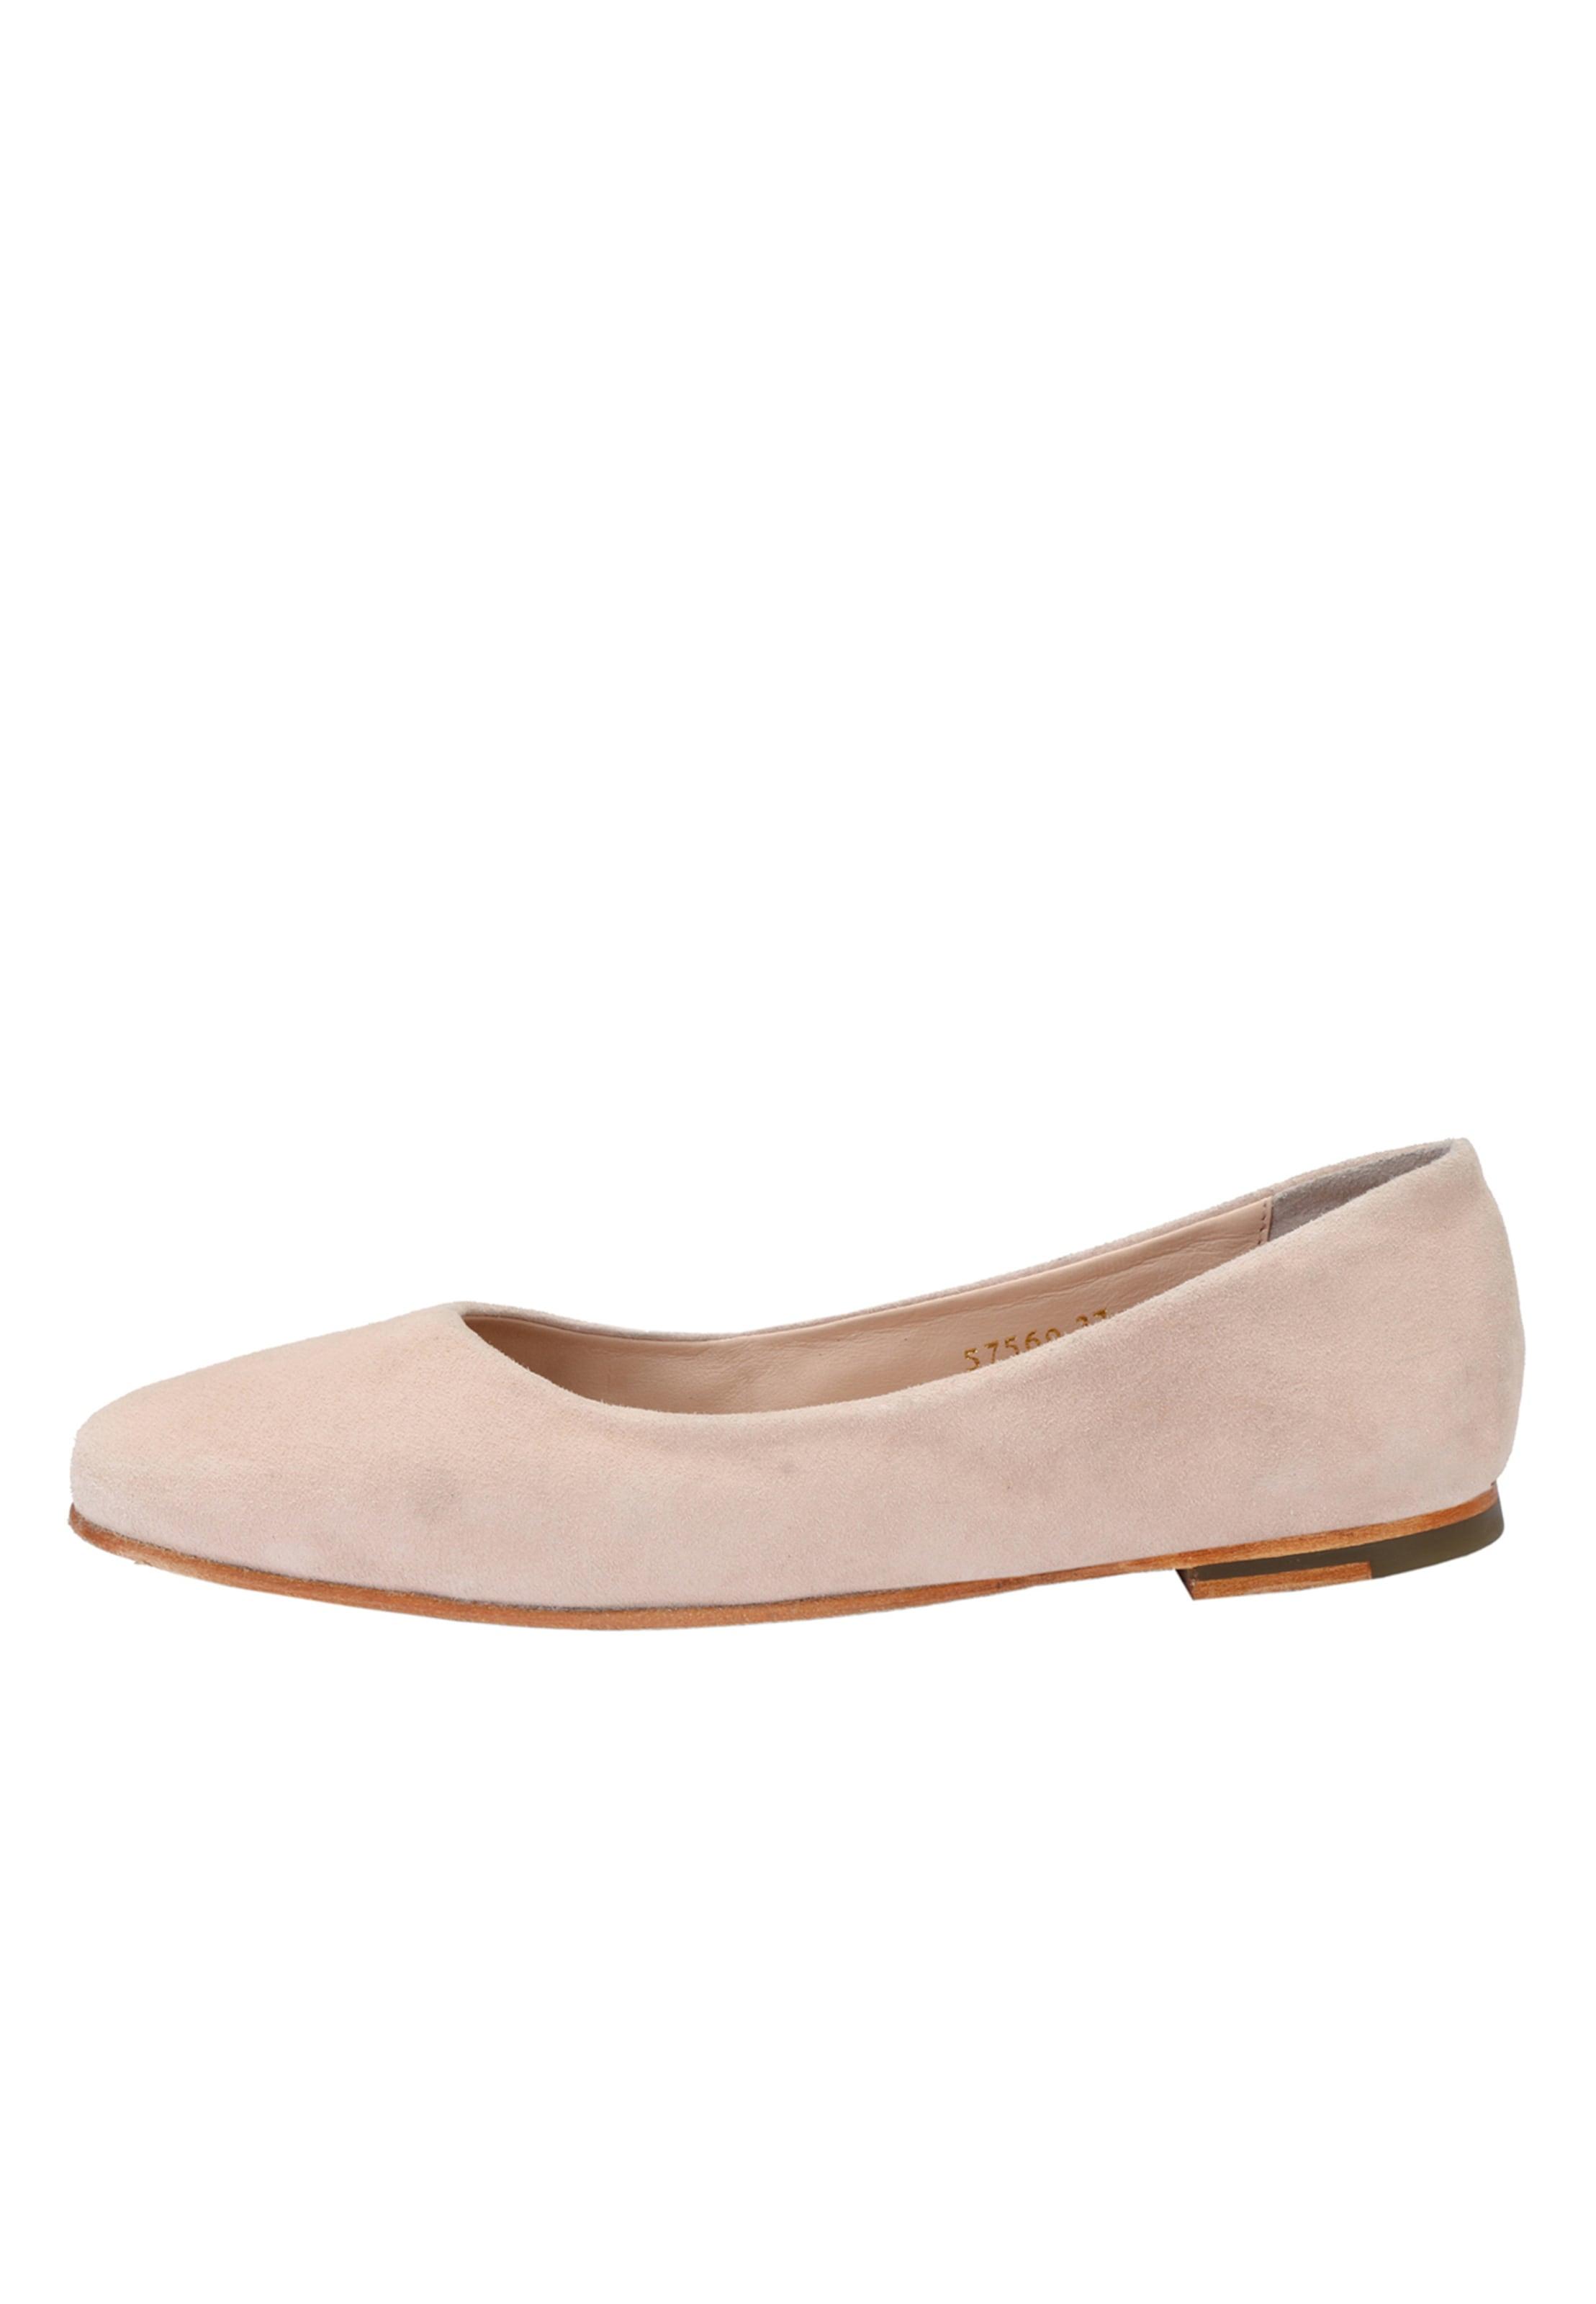 PinkRosa In Crickit In PinkRosa Ballerinas 'claire' 'claire' Crickit In Crickit Ballerinas 'claire' Ballerinas JTlKF1c3